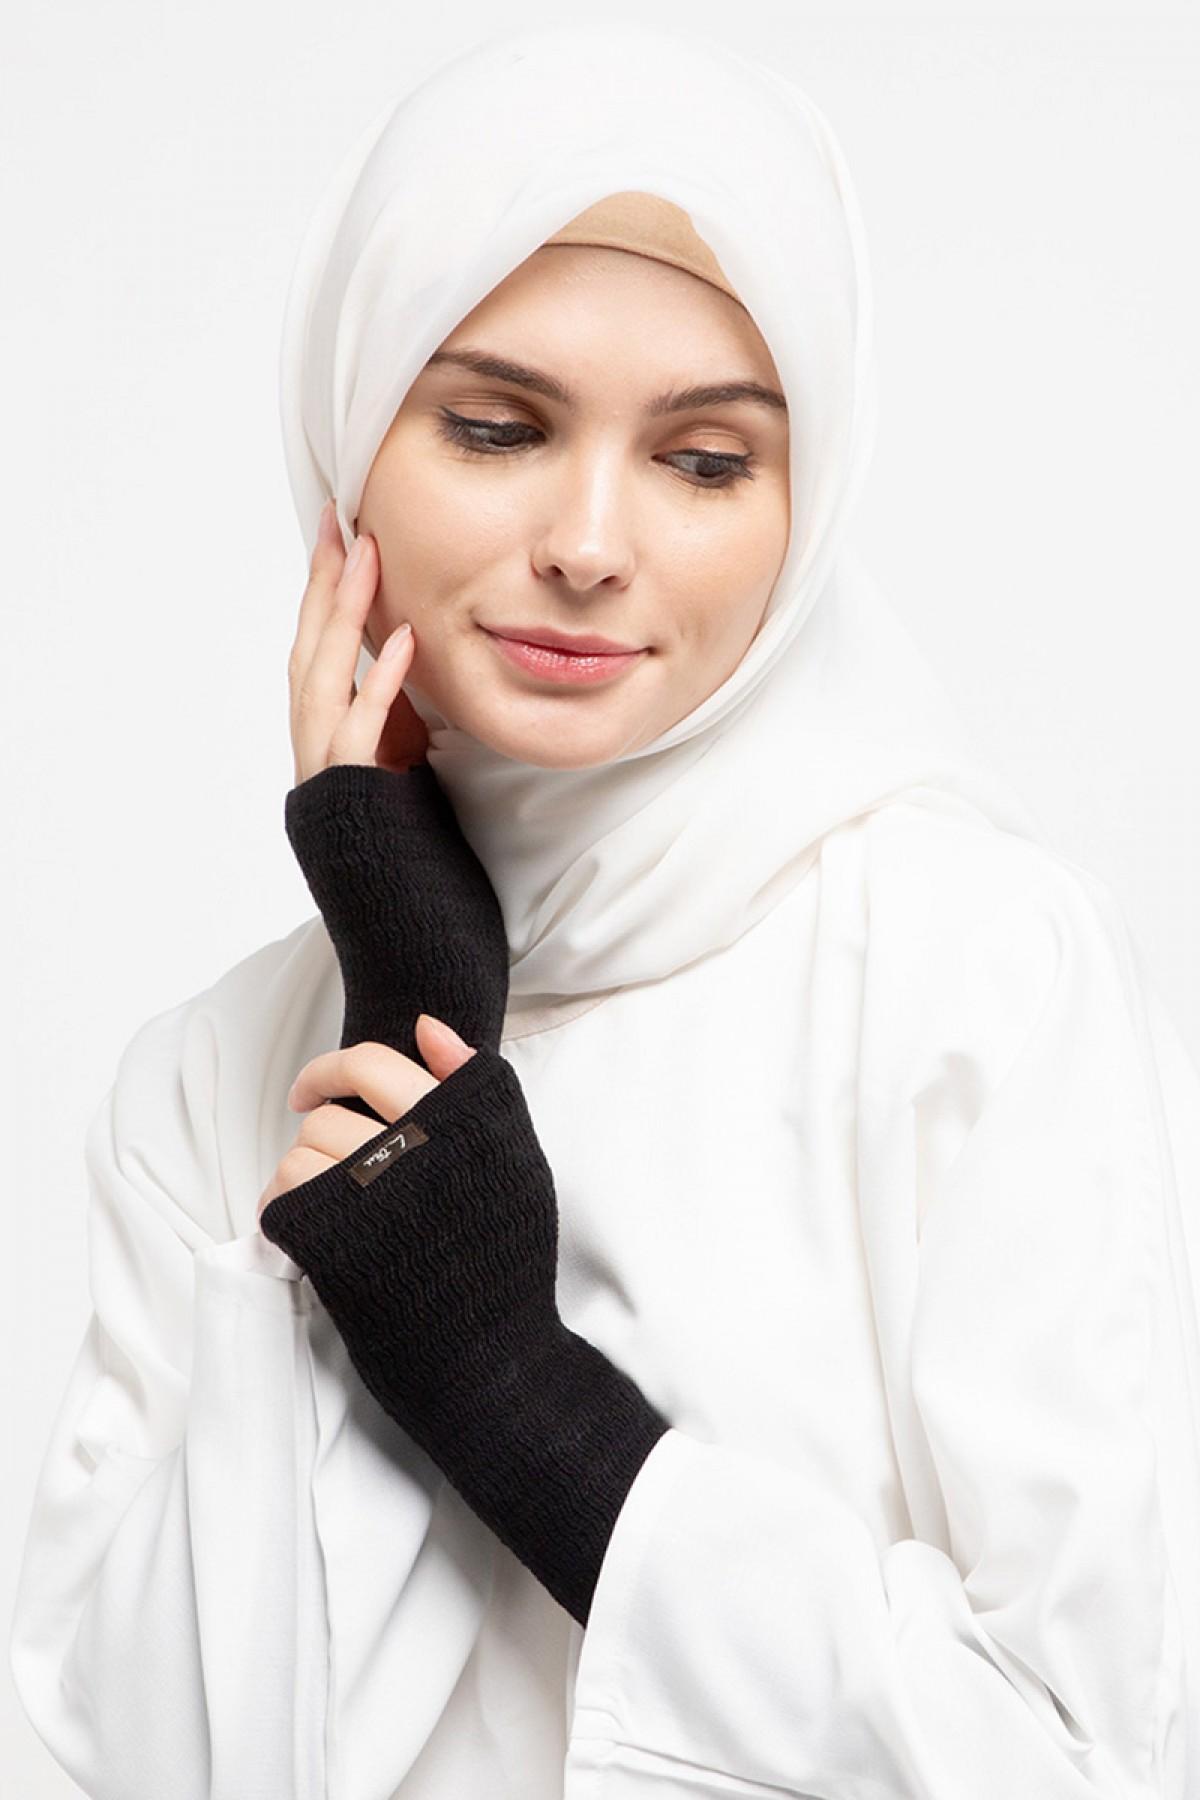 Long Handsocks Knitting Overset Black - L.tru